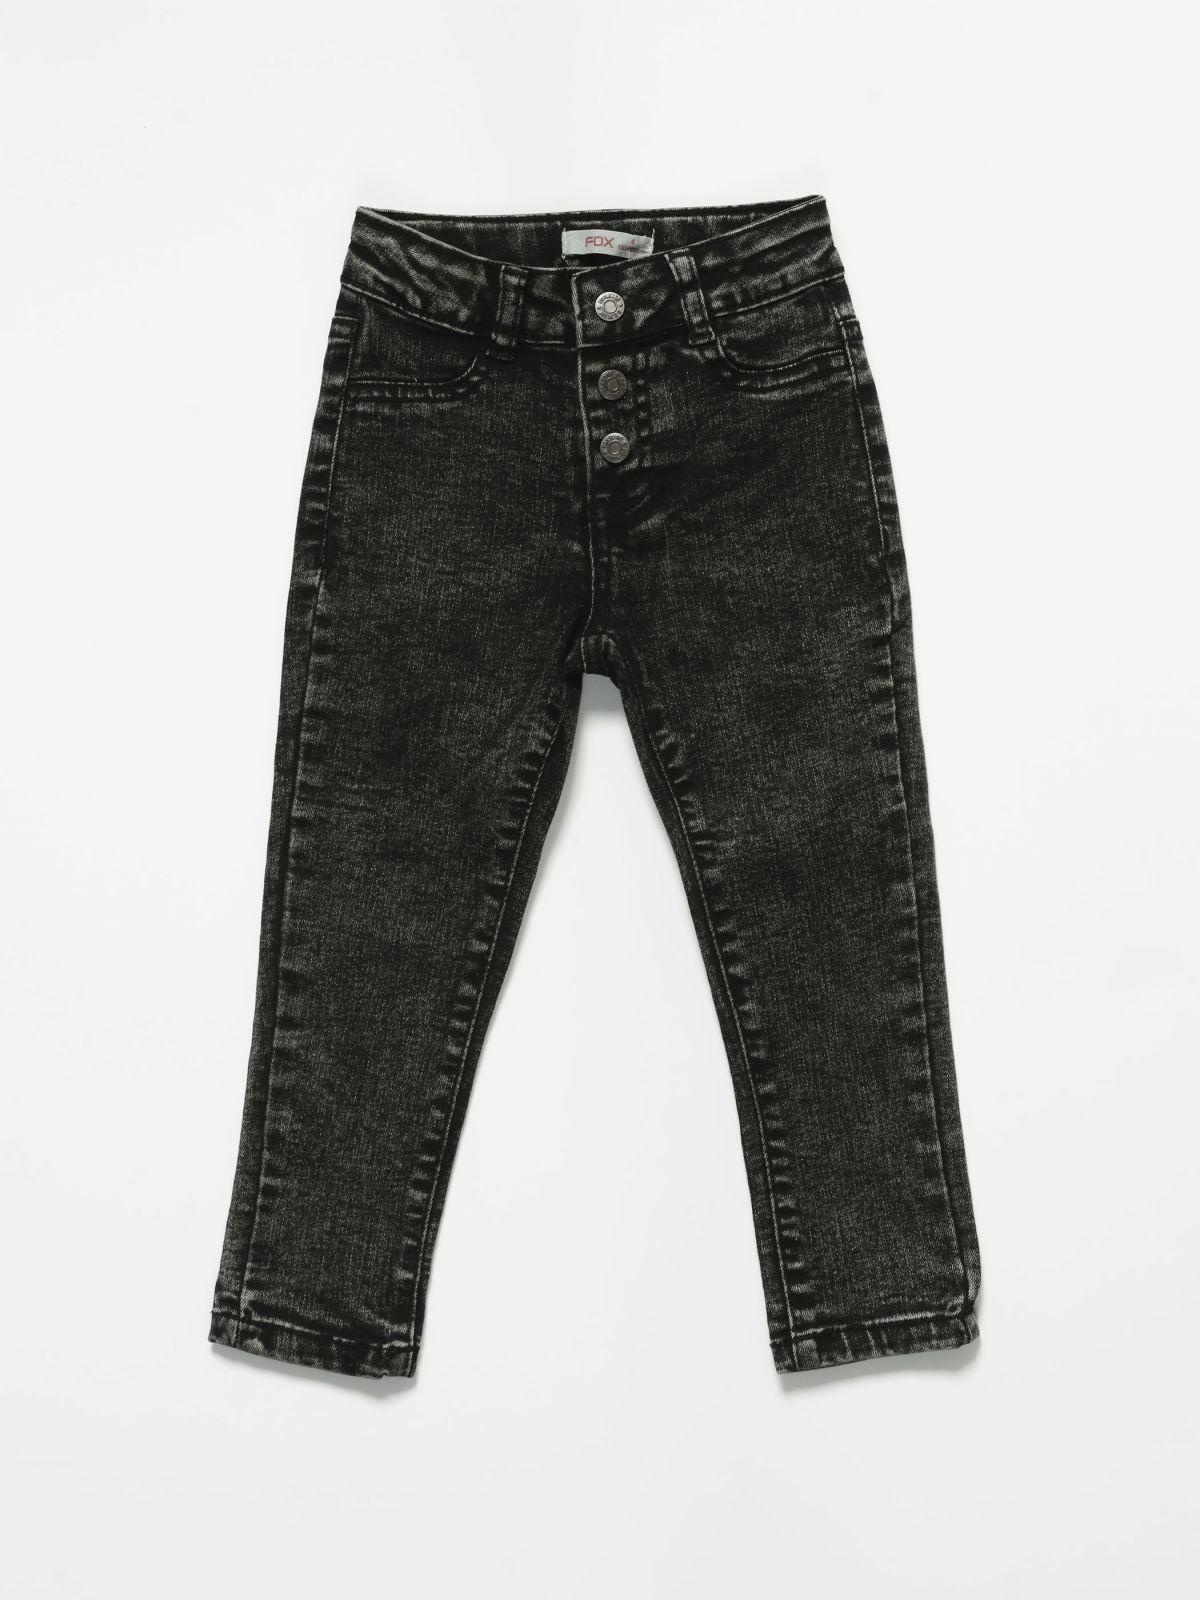 ג'ינס אסיד ווש ארוך / בנותג'ינס אסיד ווש ארוך / בנות של FOX